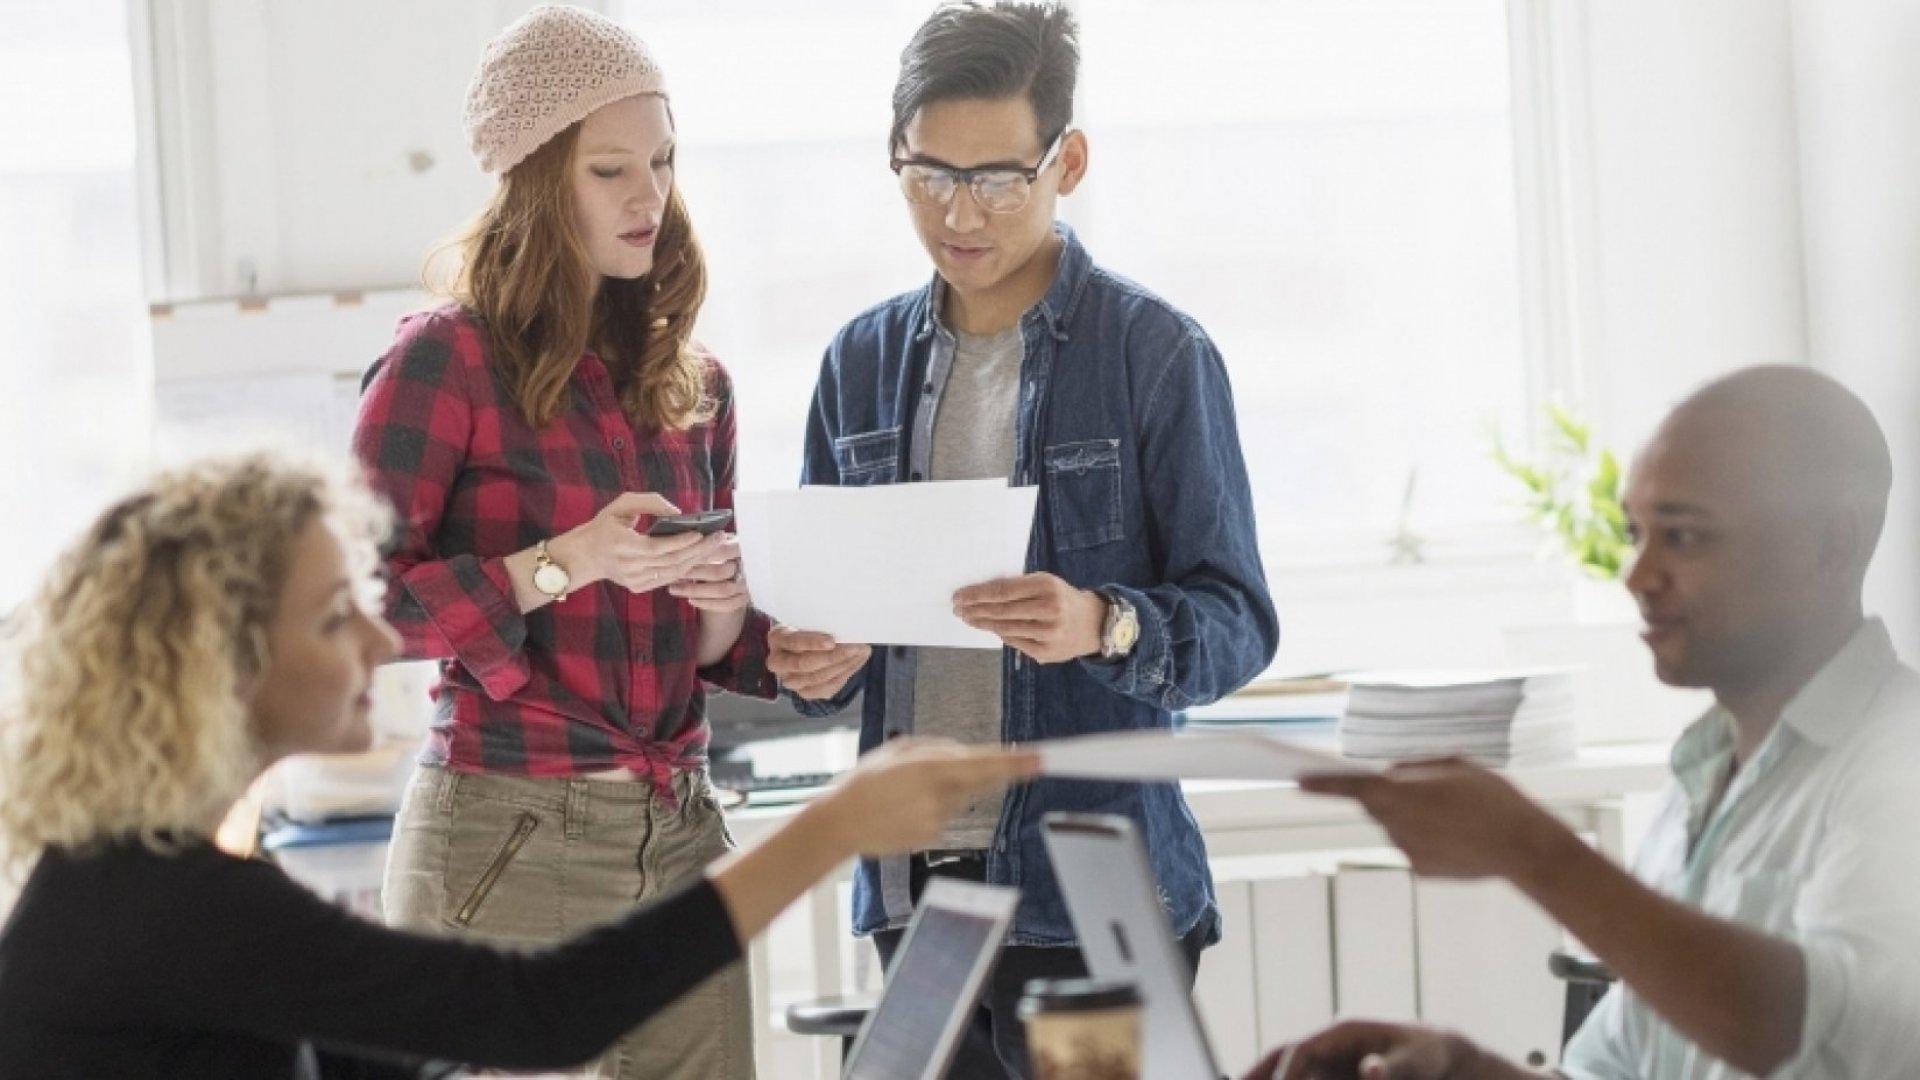 8 Things You Must Do When Hiring Millennials